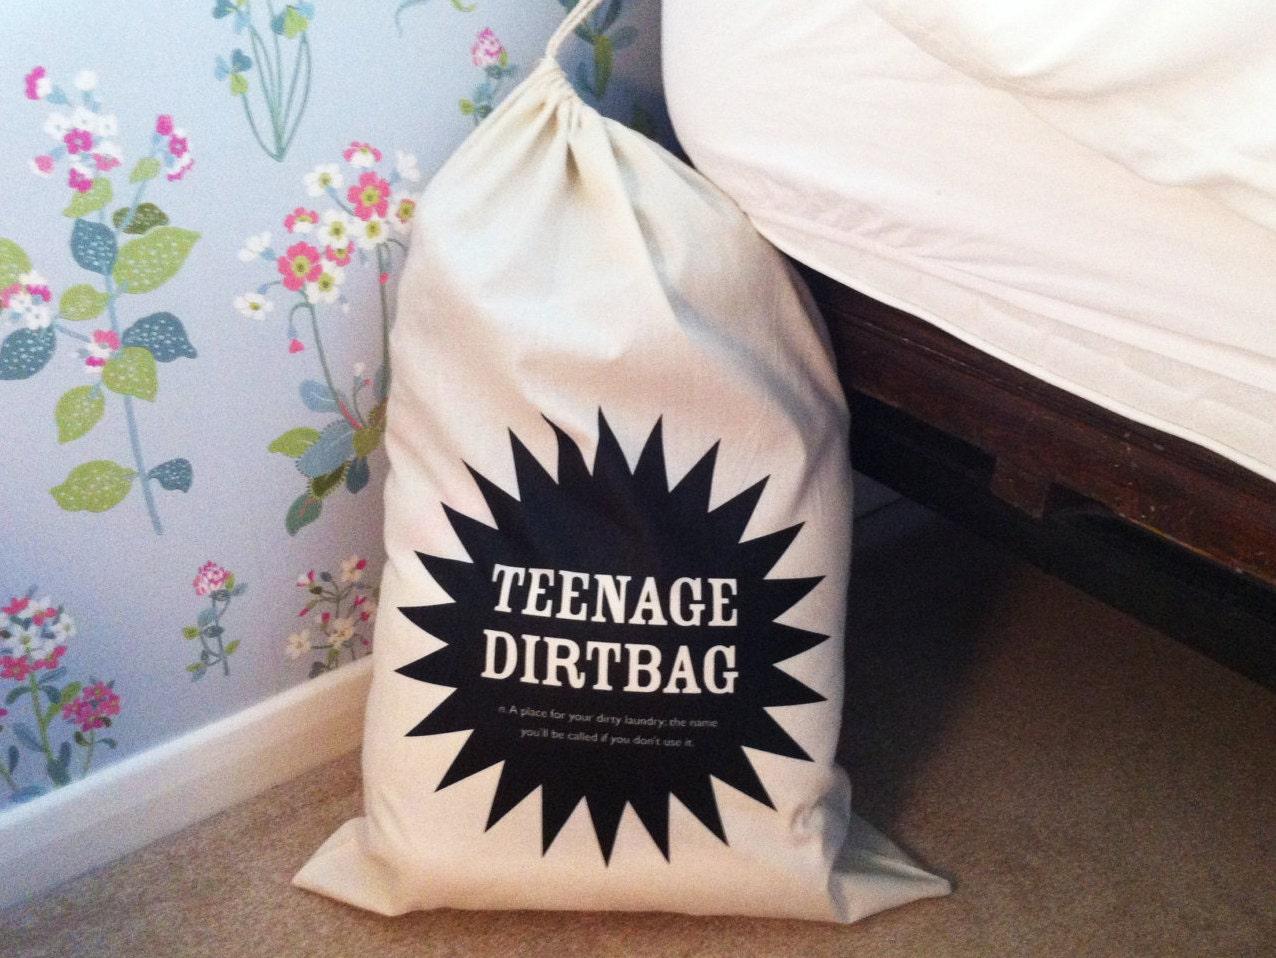 Teenage Dirtbag Drawstring Laundry Bag Teenager Gift